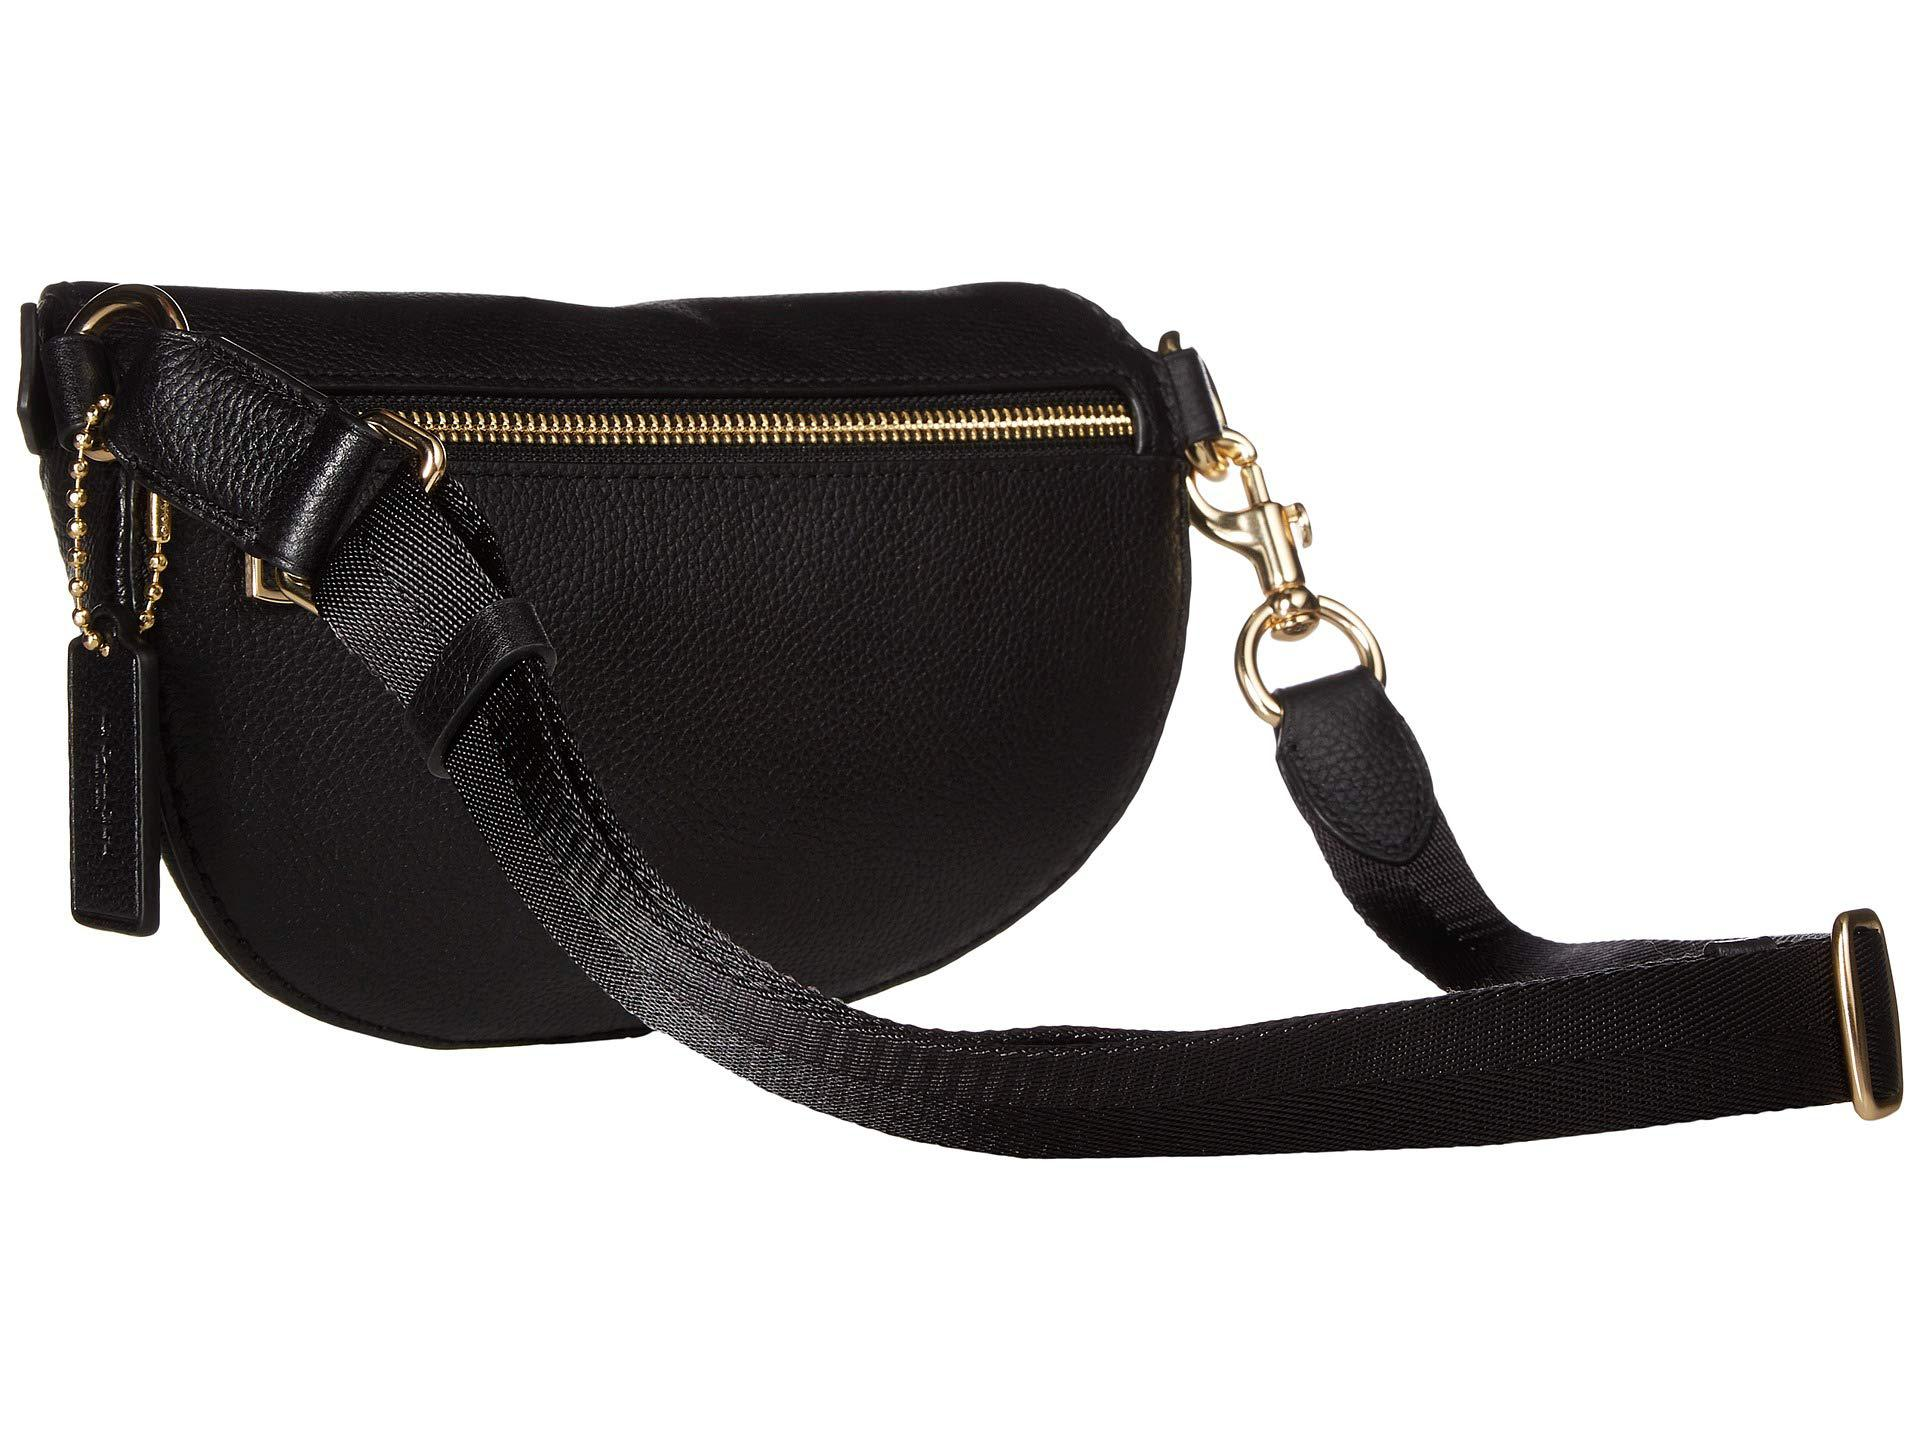 ad9629554b0 coach-GDBlack-Polished-Pebble-Belt-Bag-gdblack-Wallet.jpeg